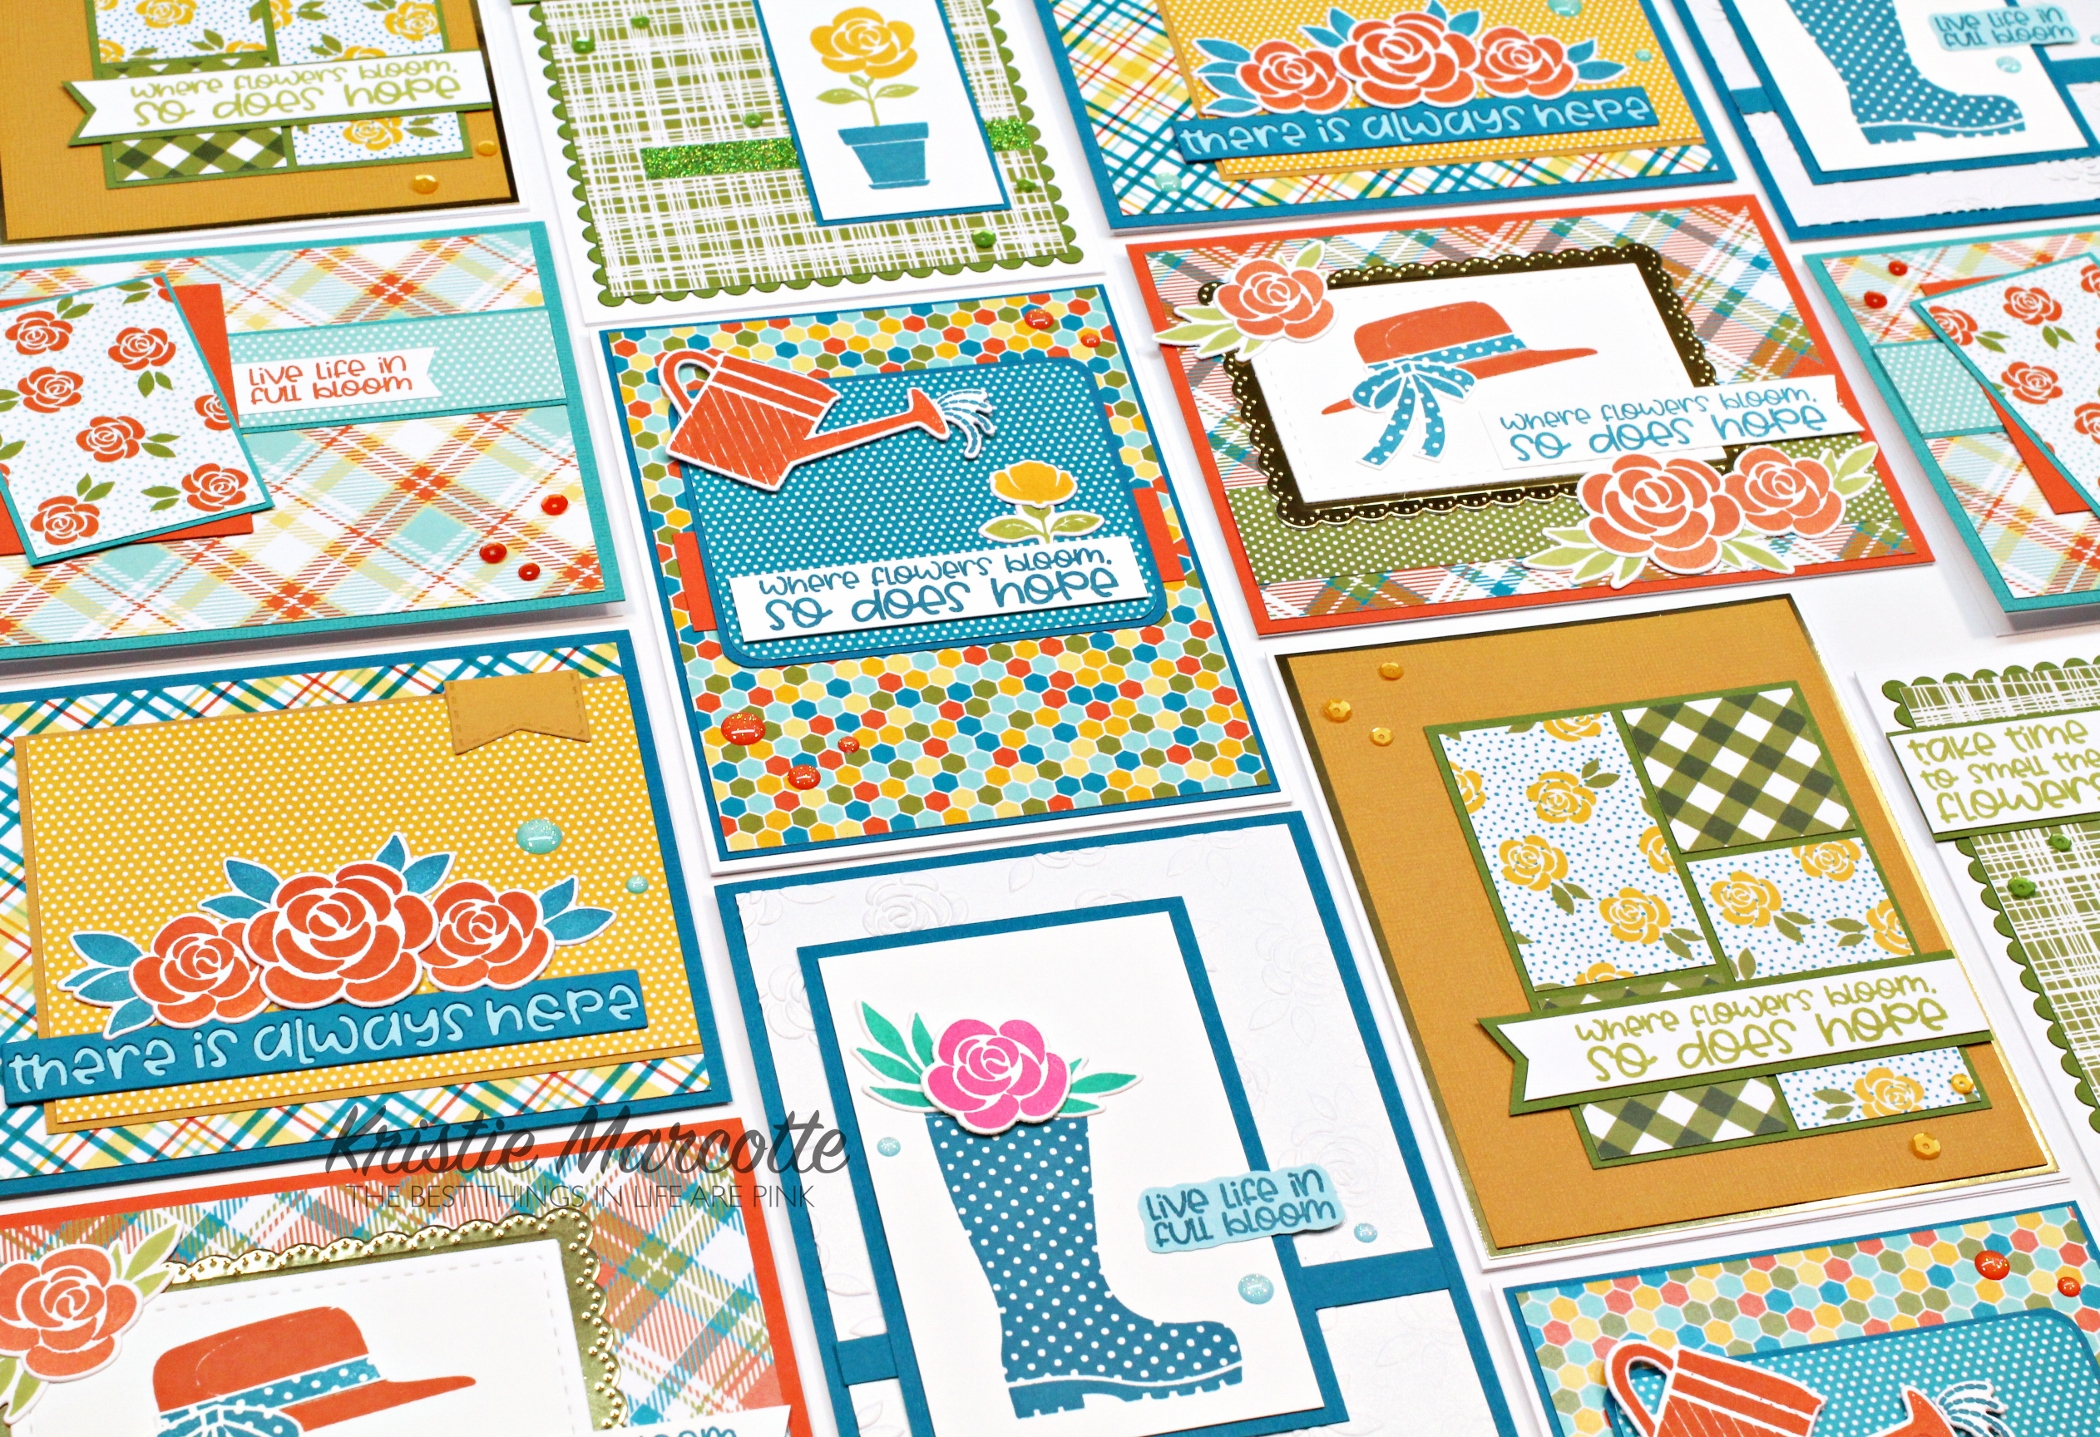 Pink & Main – April 2021 Crafty Courtyard kit – 14 cards 1 kit